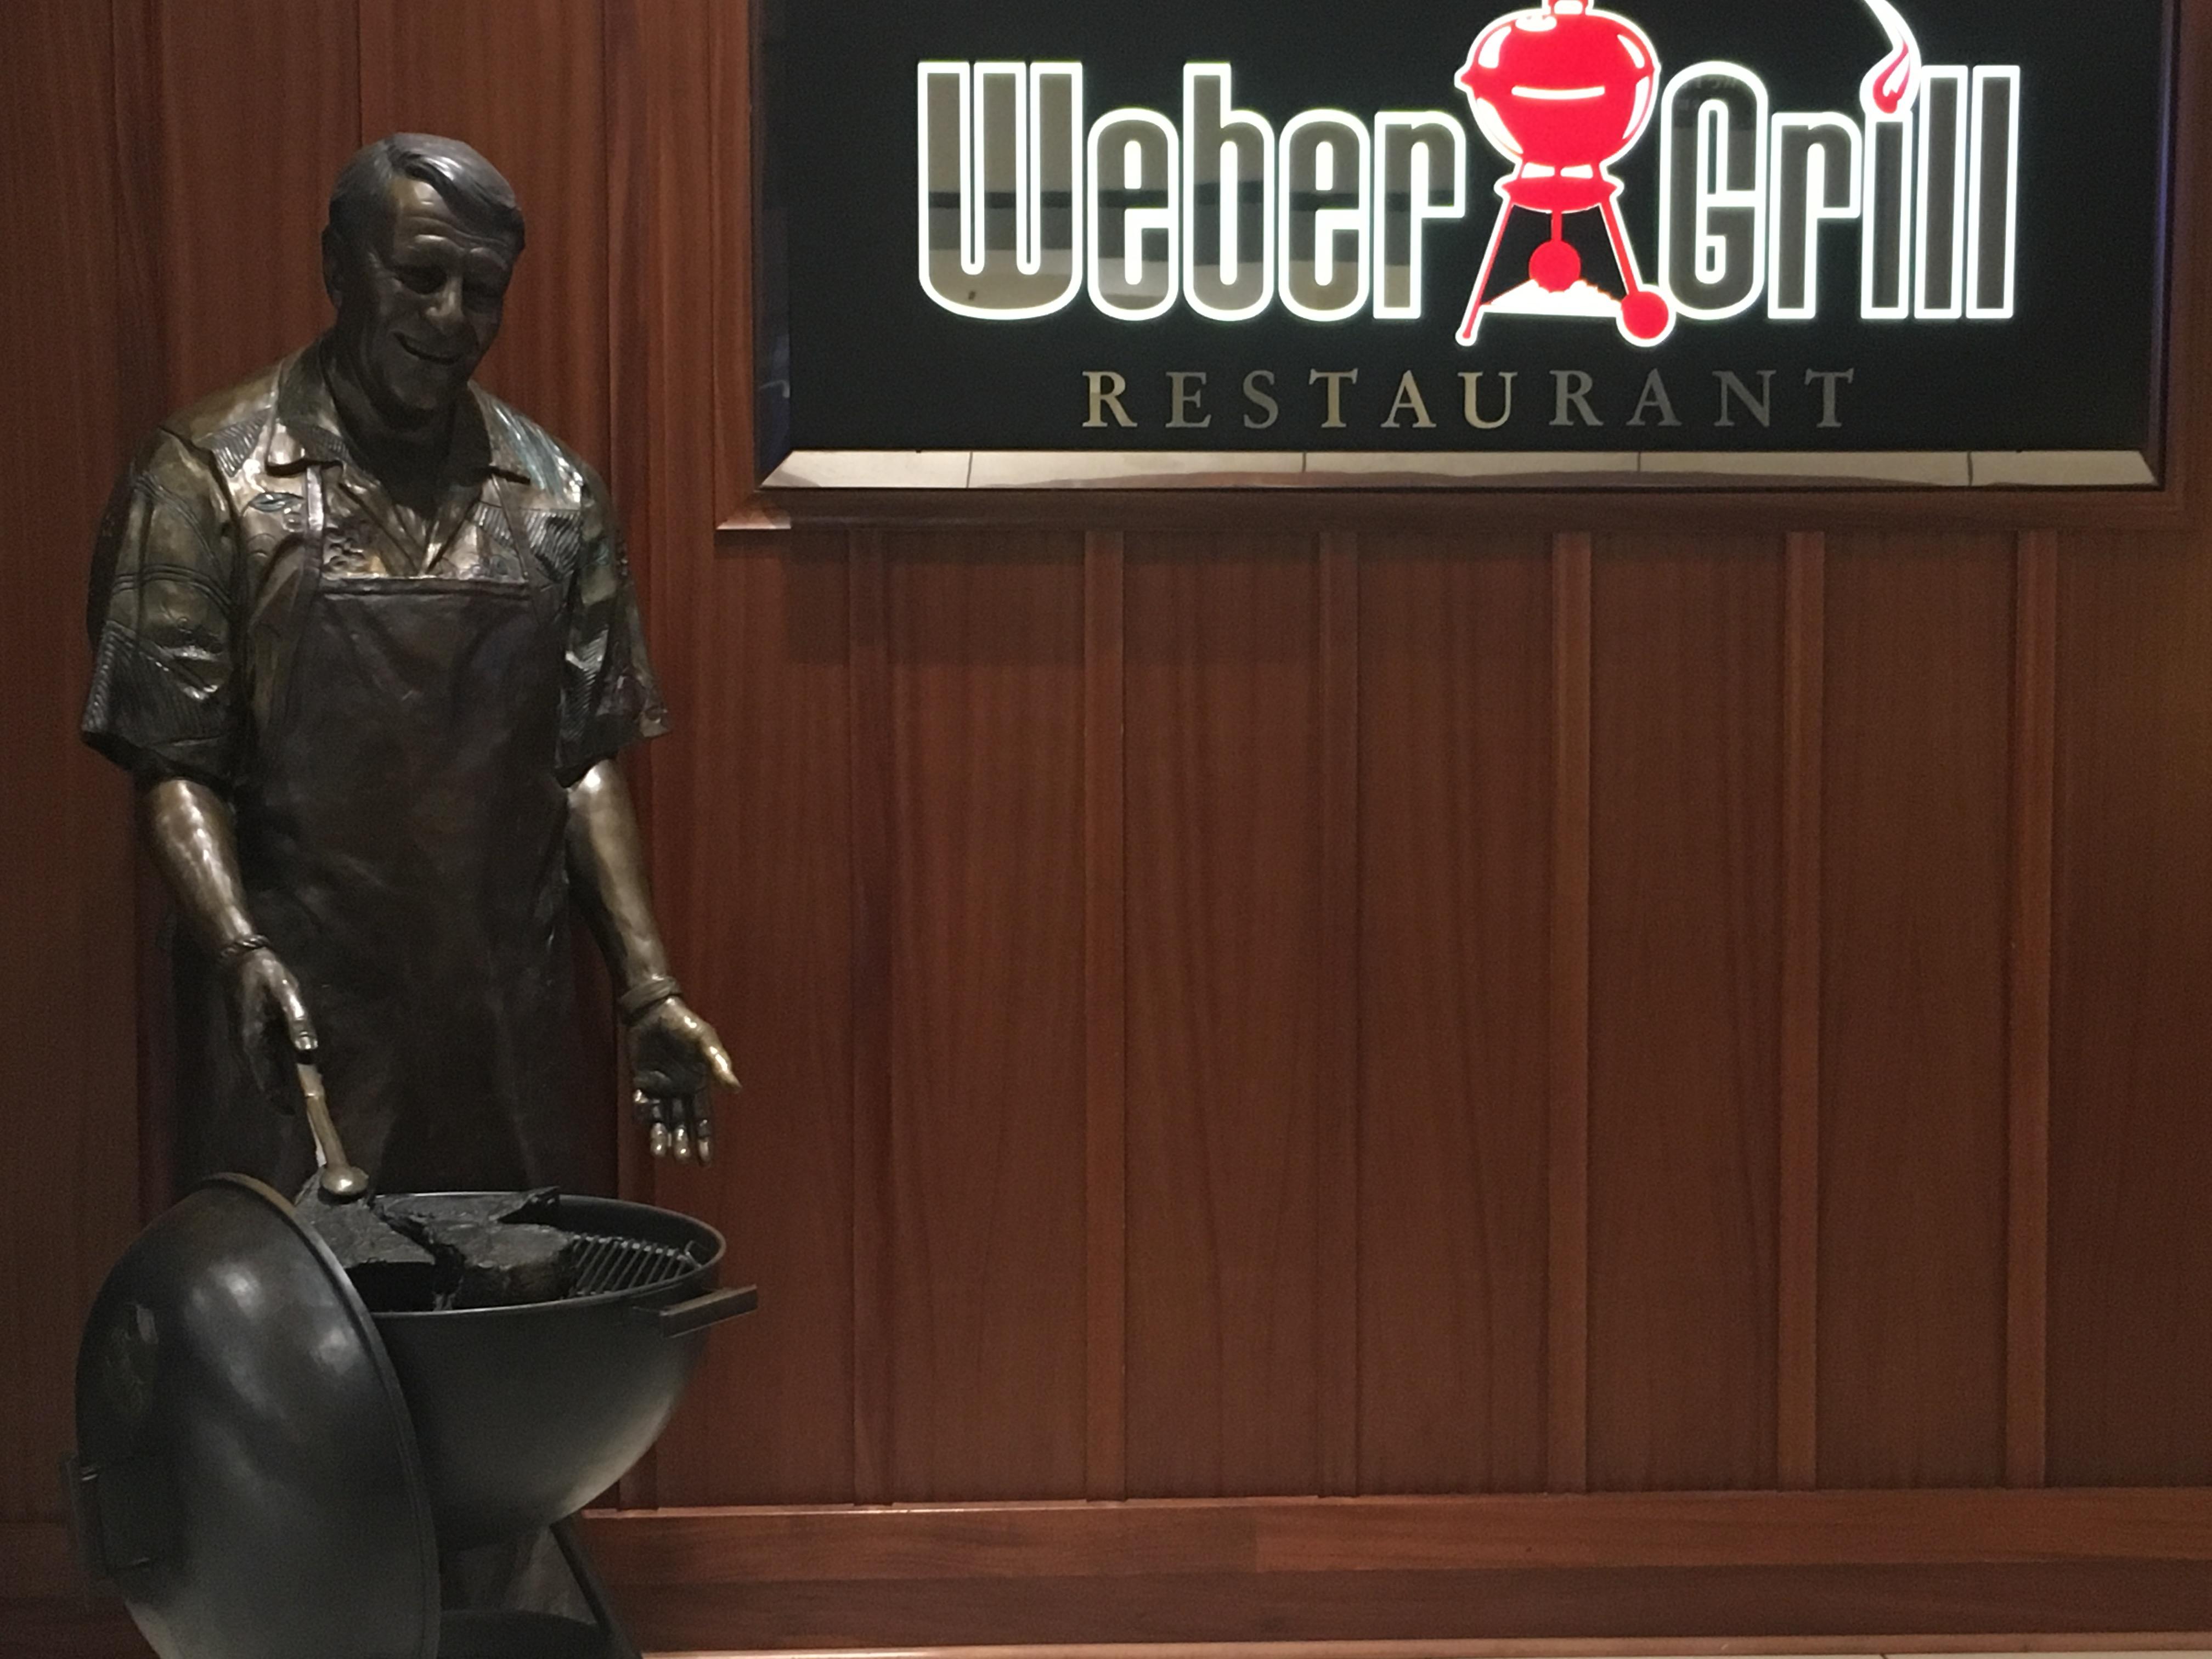 Weber Grill Restaurants